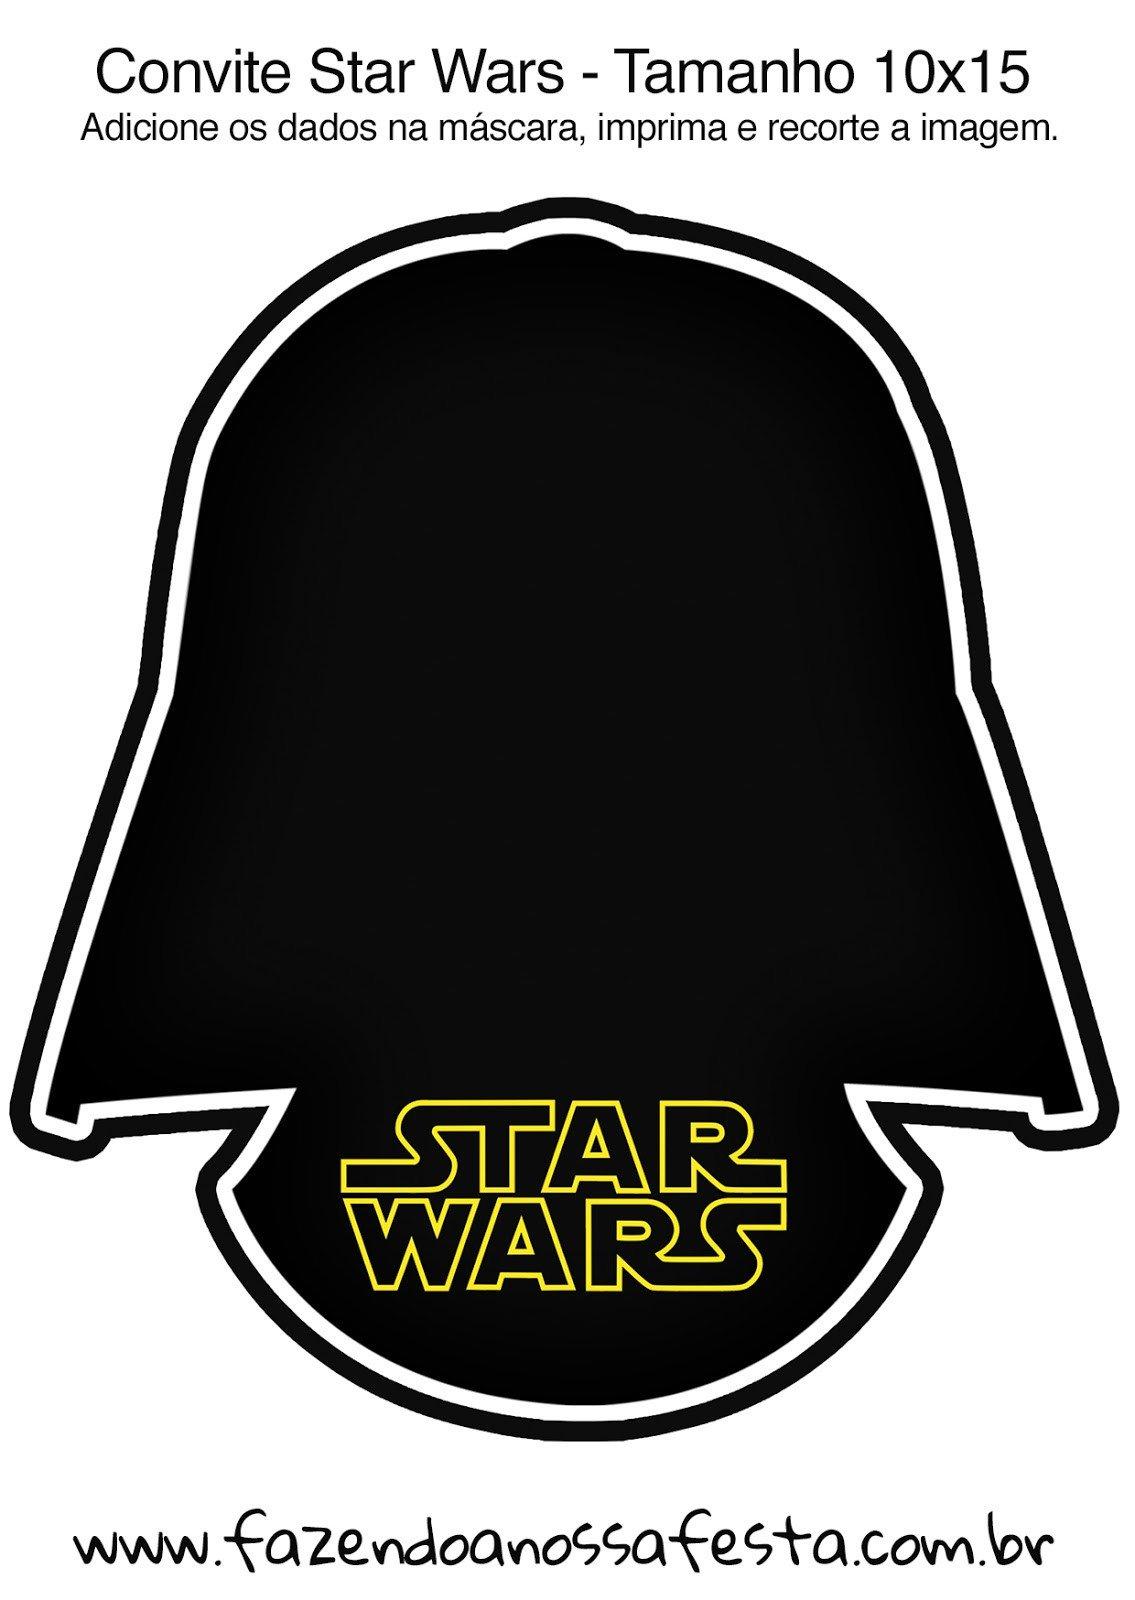 Printable Star Wars Invitation Star Wars Free Printable Invitations Oh My Fiesta for